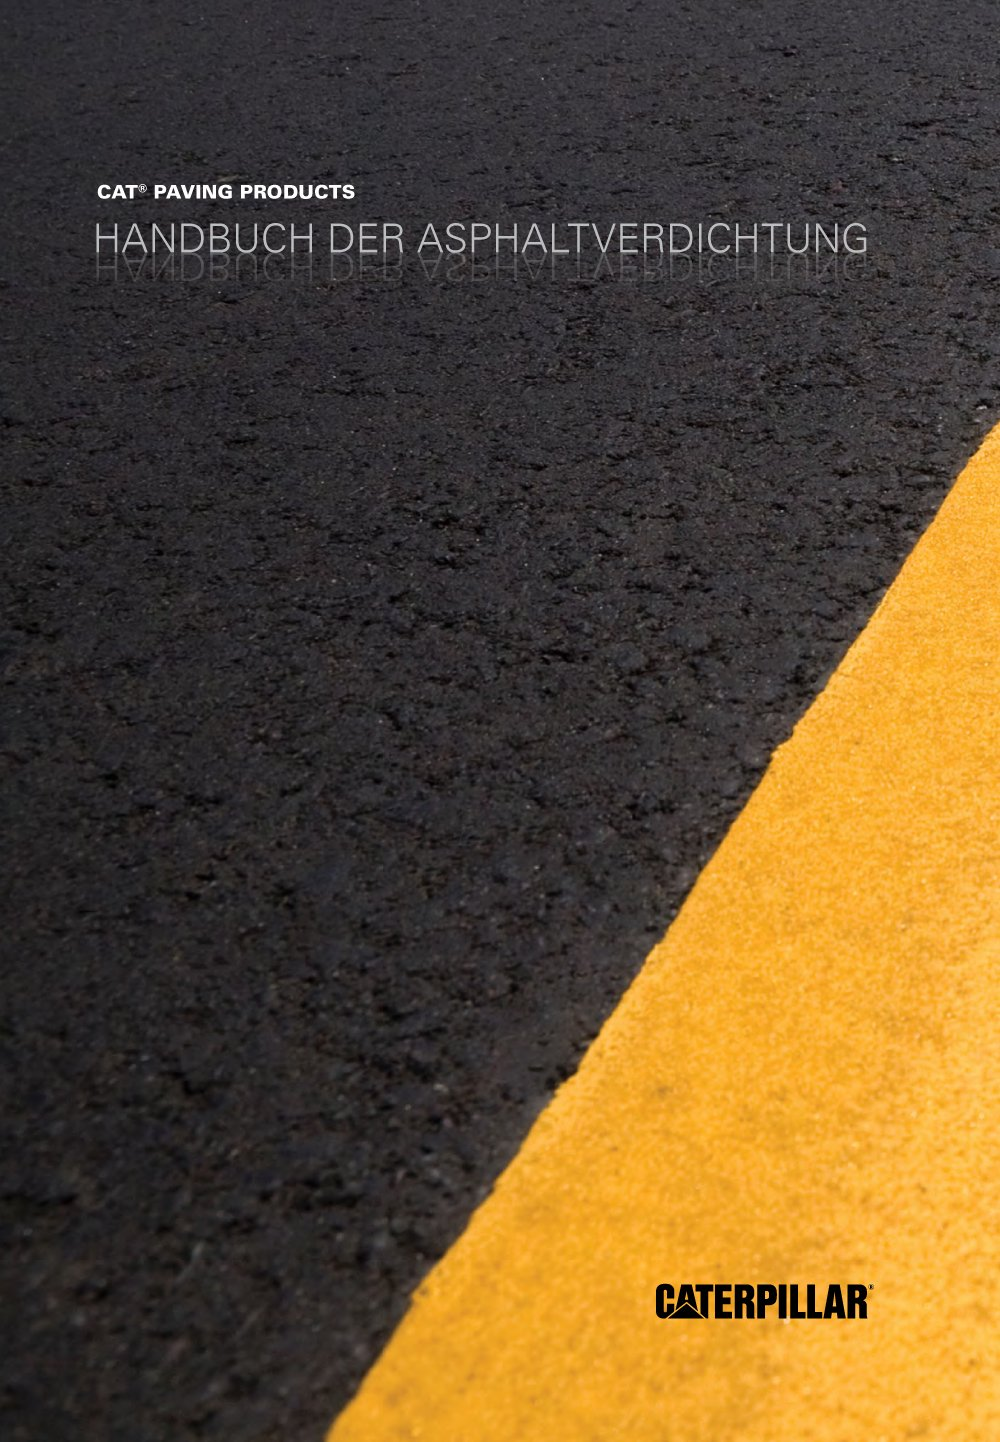 Download Handbuch der Asphaltverdichtung / Guide to Asphalt Compaction (German) by Caterpillar Paving Products (2012) ebook